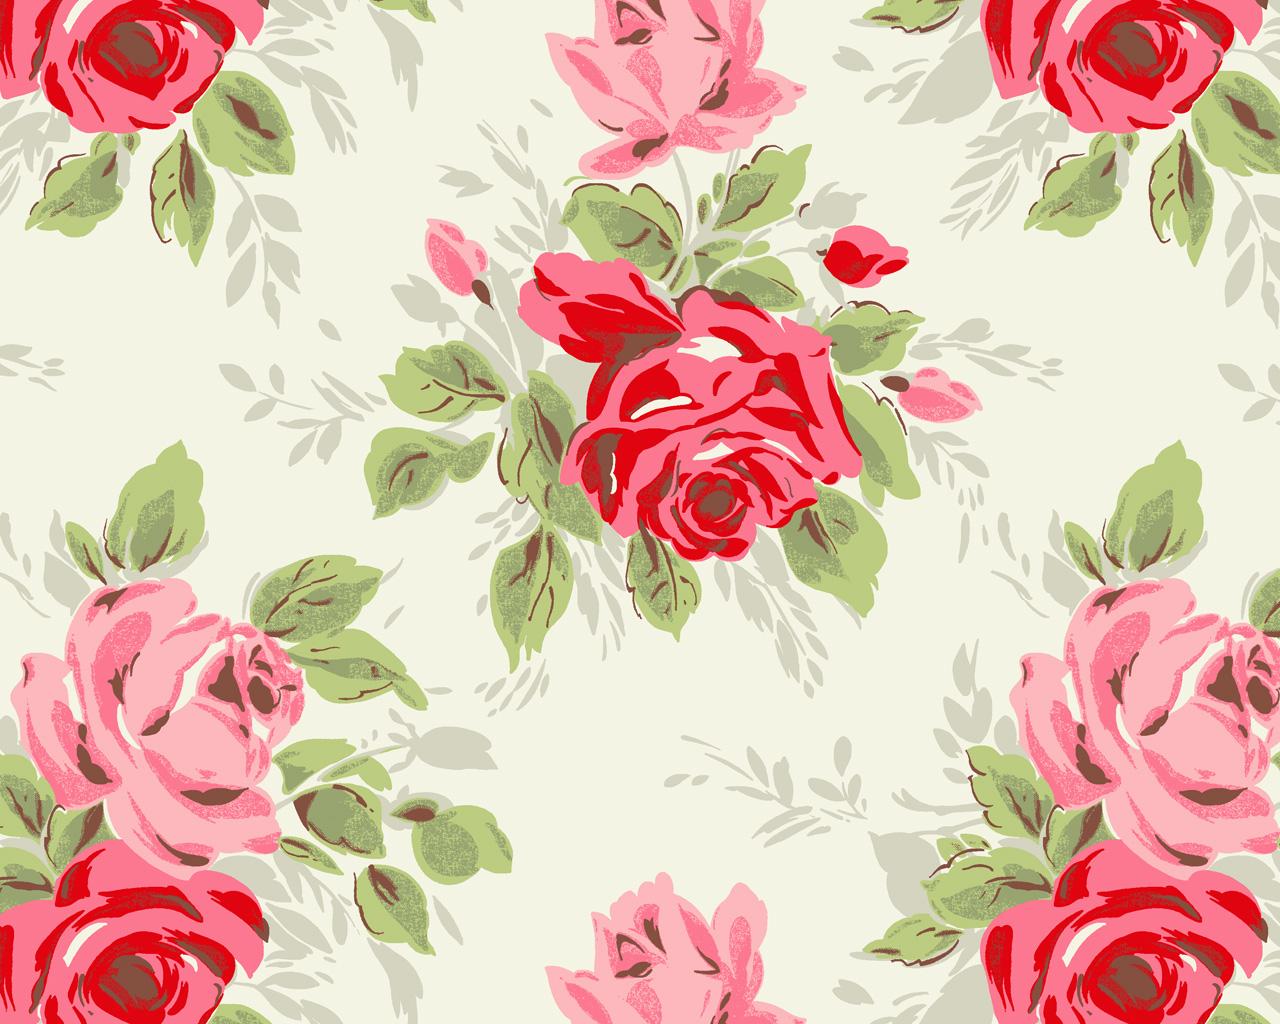 Free download Floral Print Wallpaper HD Wallpapers Pretty ...